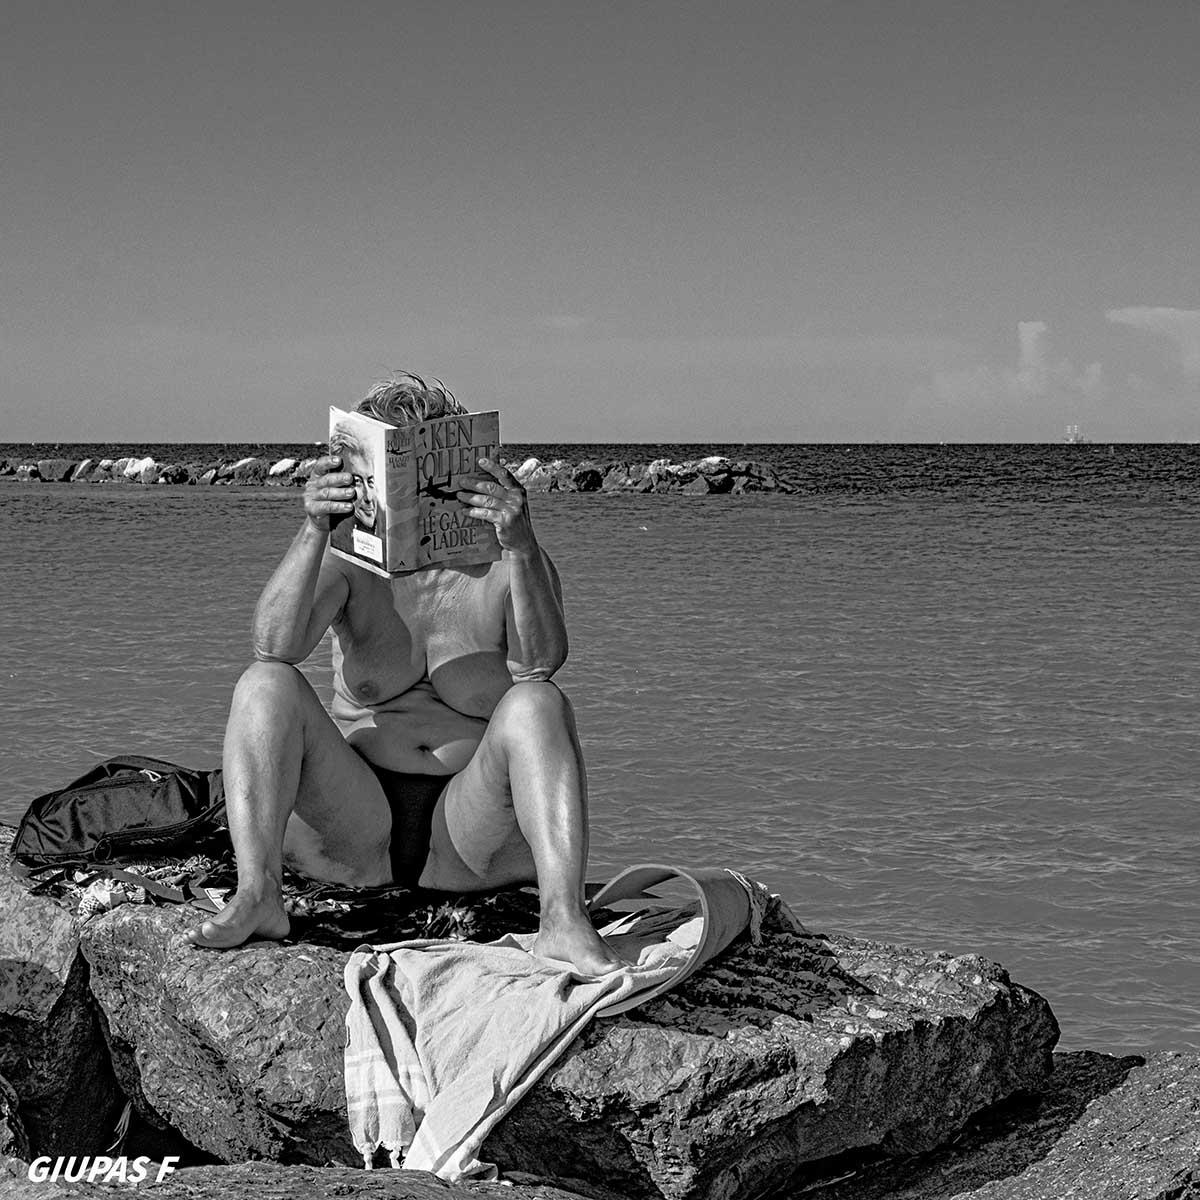 © Foto Giuliano Passuti per Romagna Street Photography